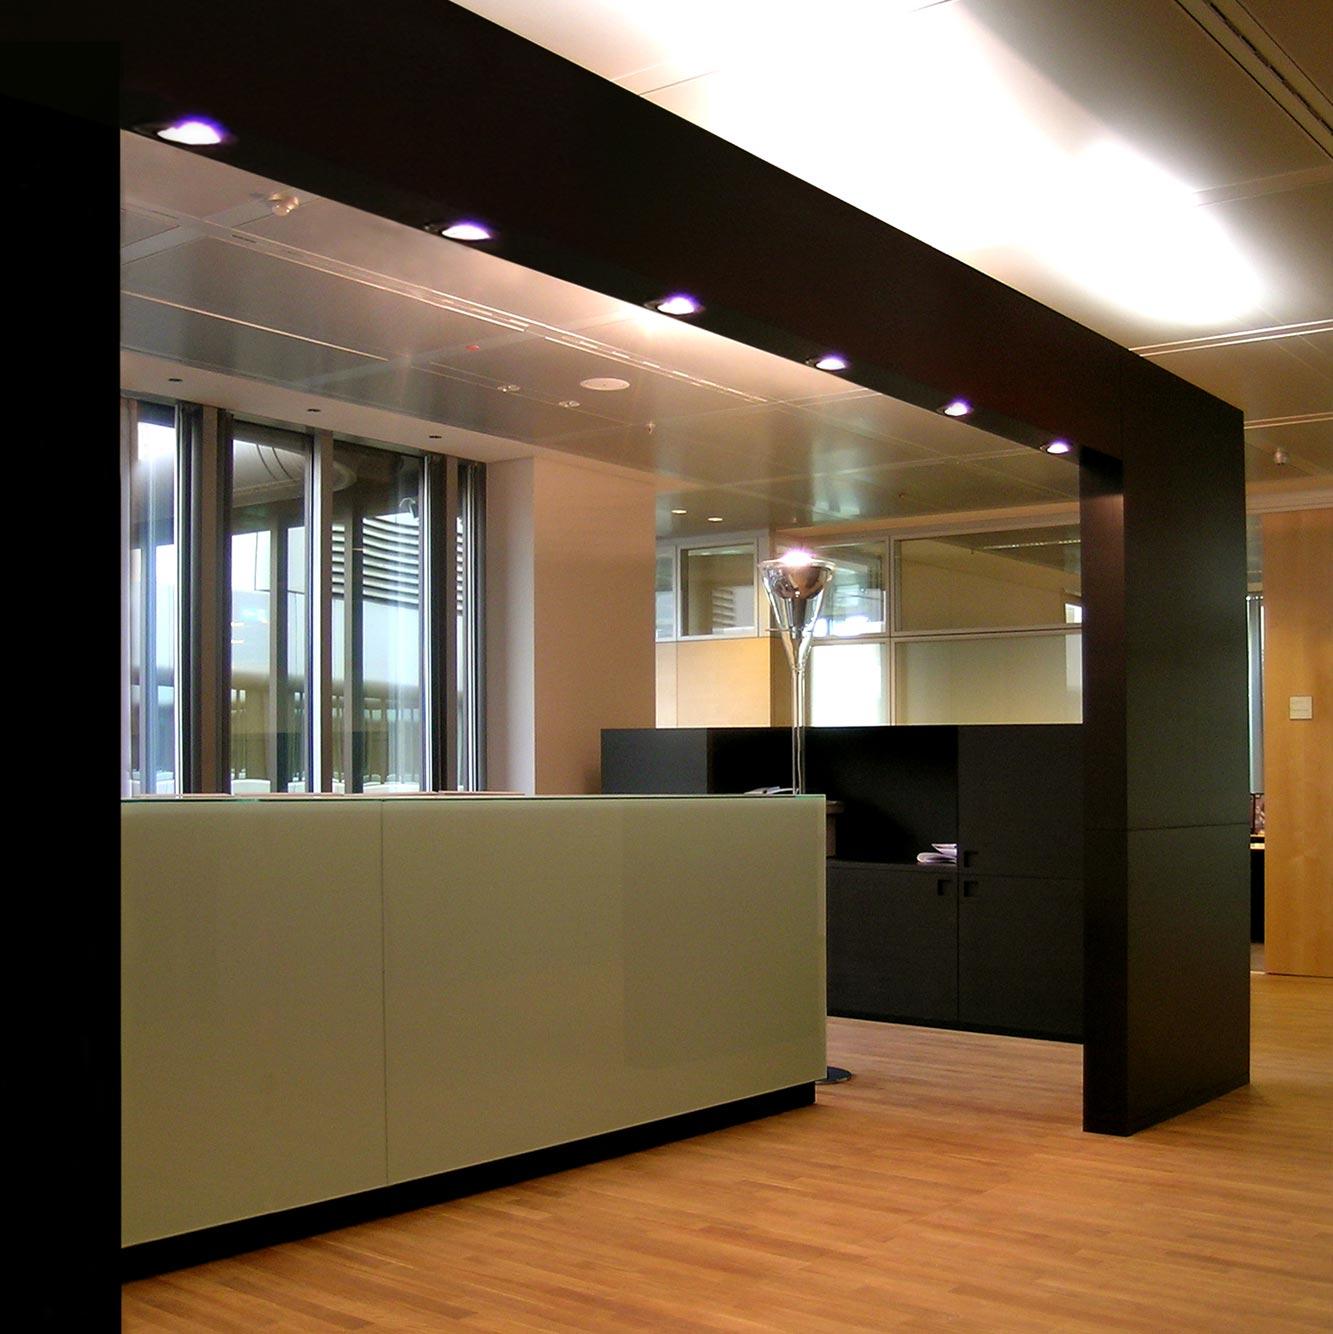 west lb d sseldorf legno werkst tte f r holzarbeiten. Black Bedroom Furniture Sets. Home Design Ideas